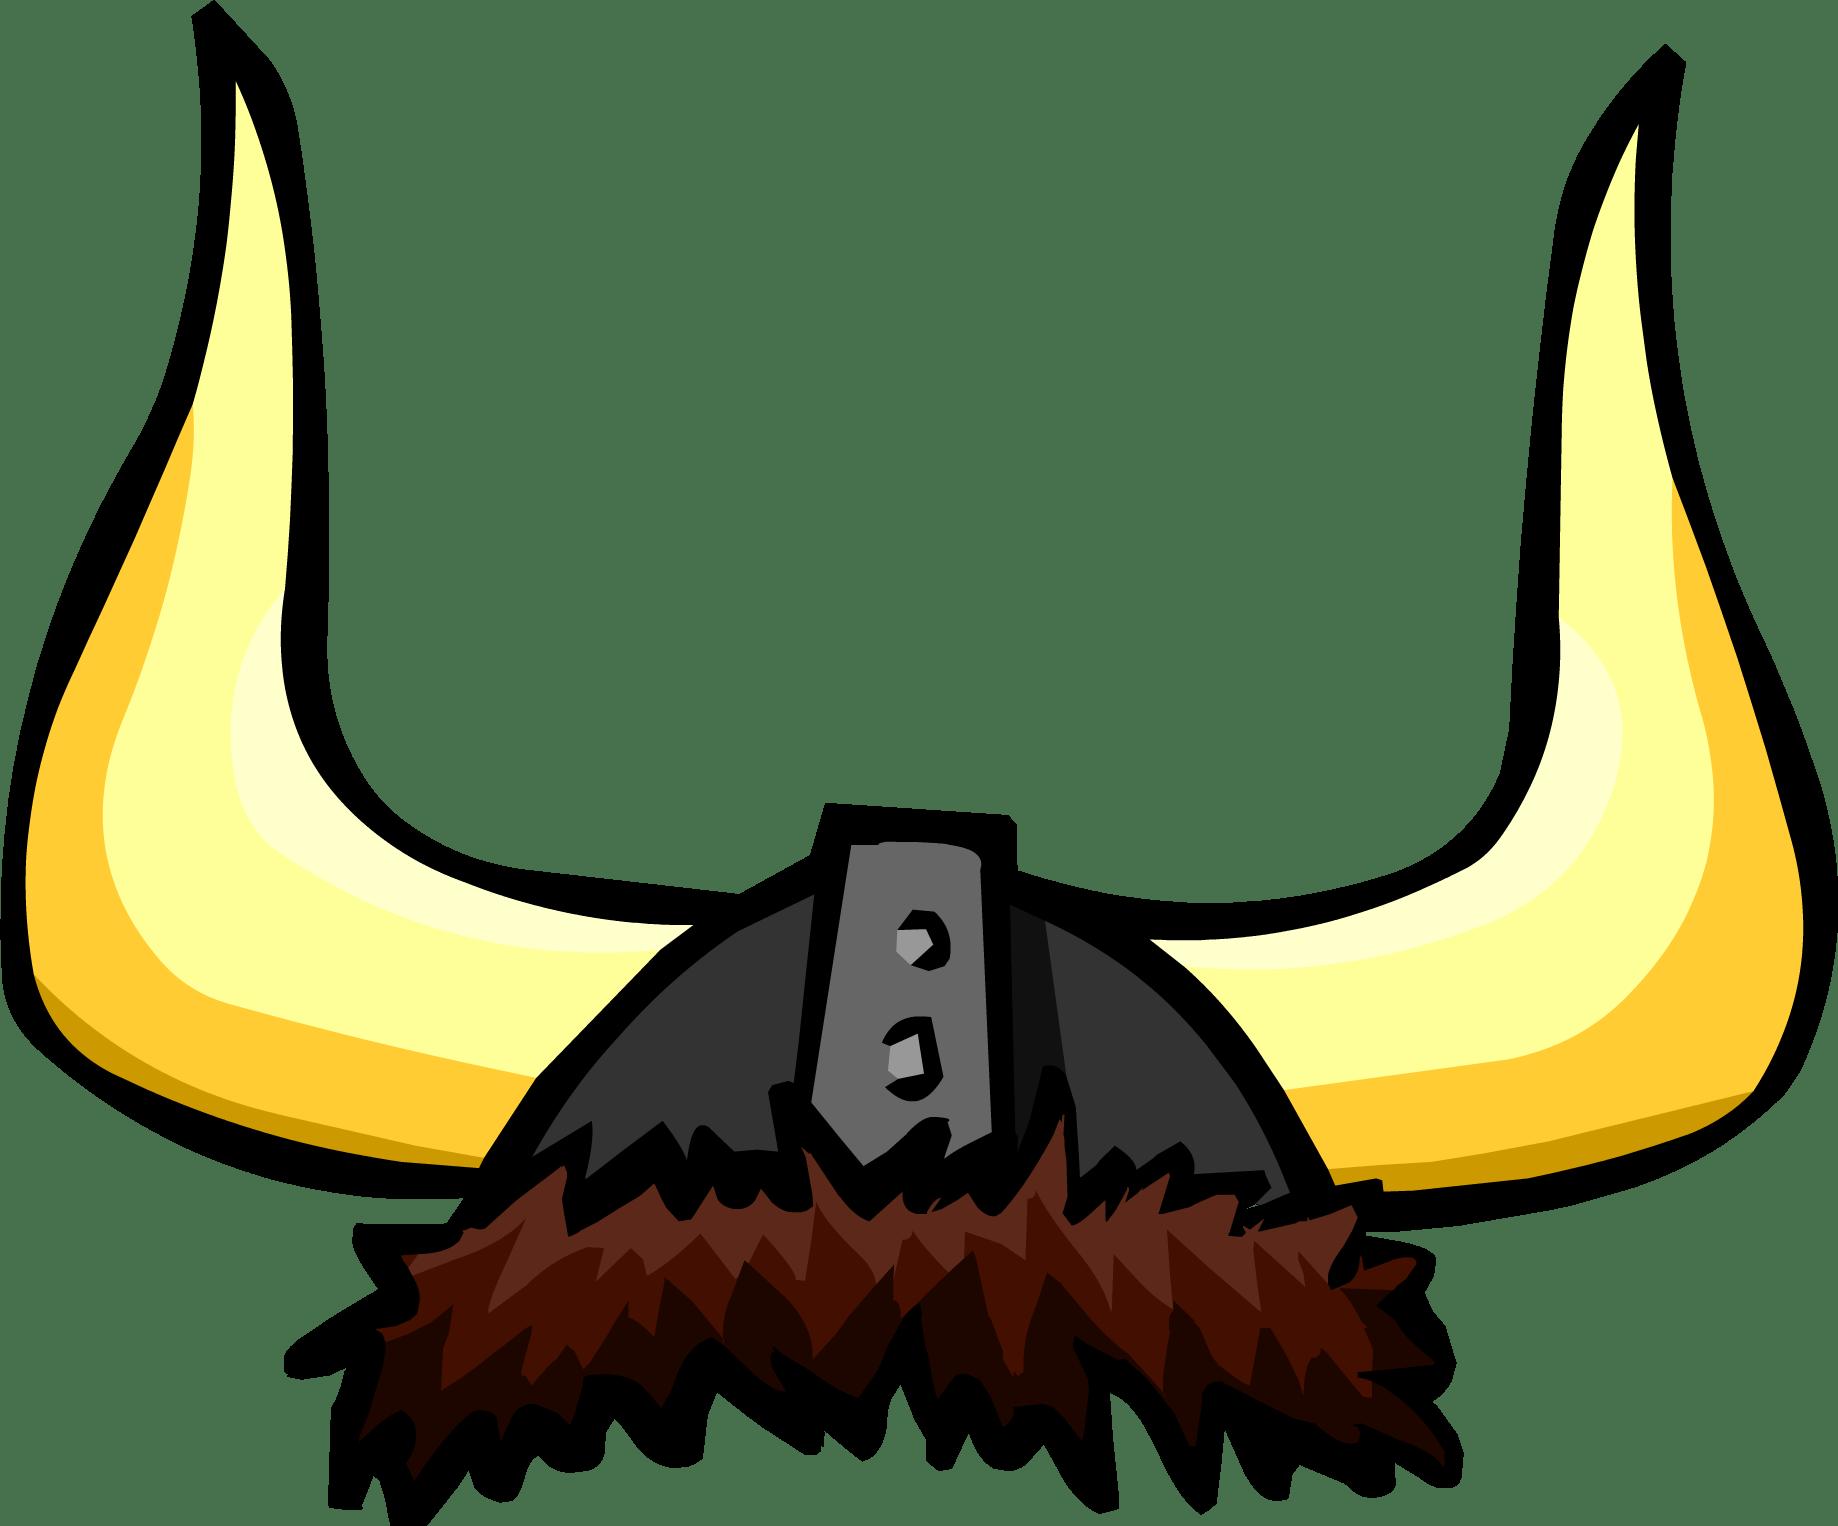 hight resolution of 1838x1526 horns clipart vikings